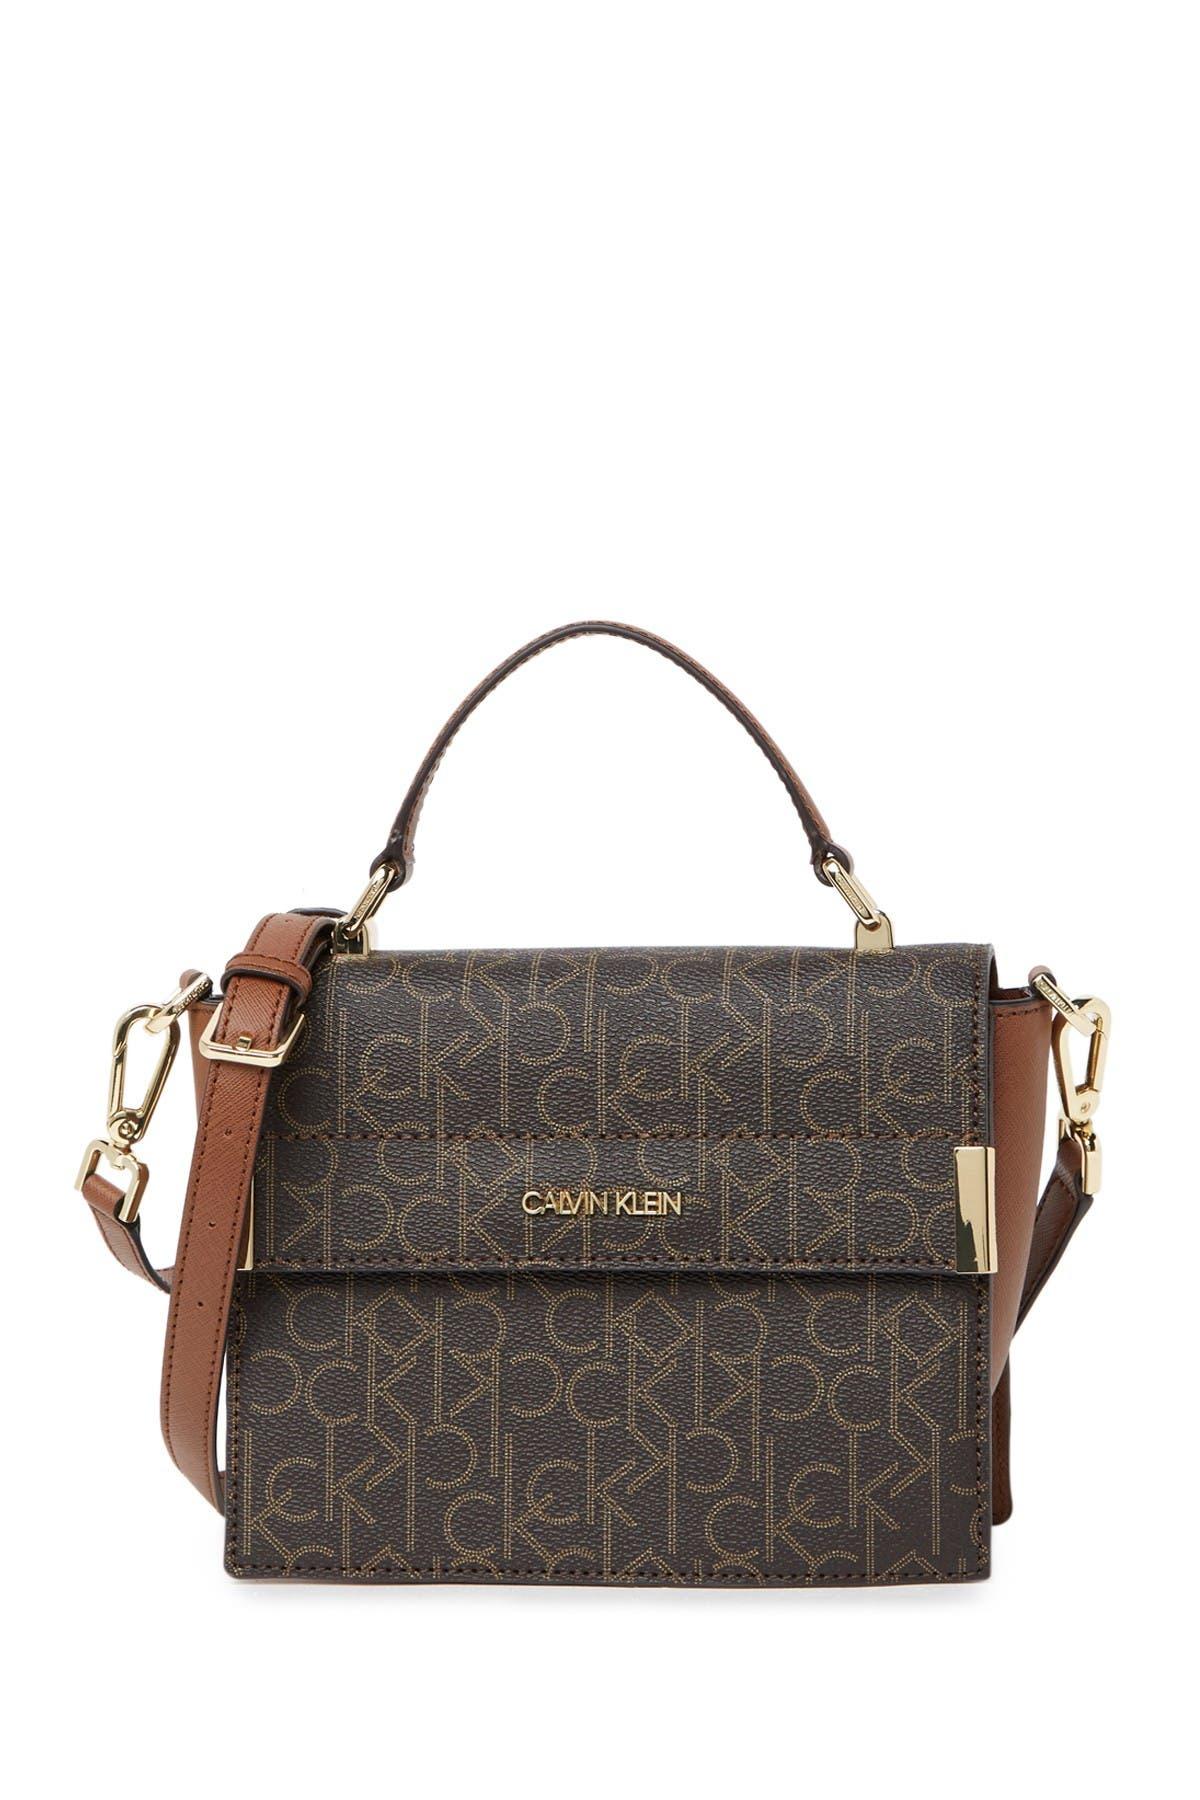 Image of Calvin Klein Signature Logo Crossbody Bag